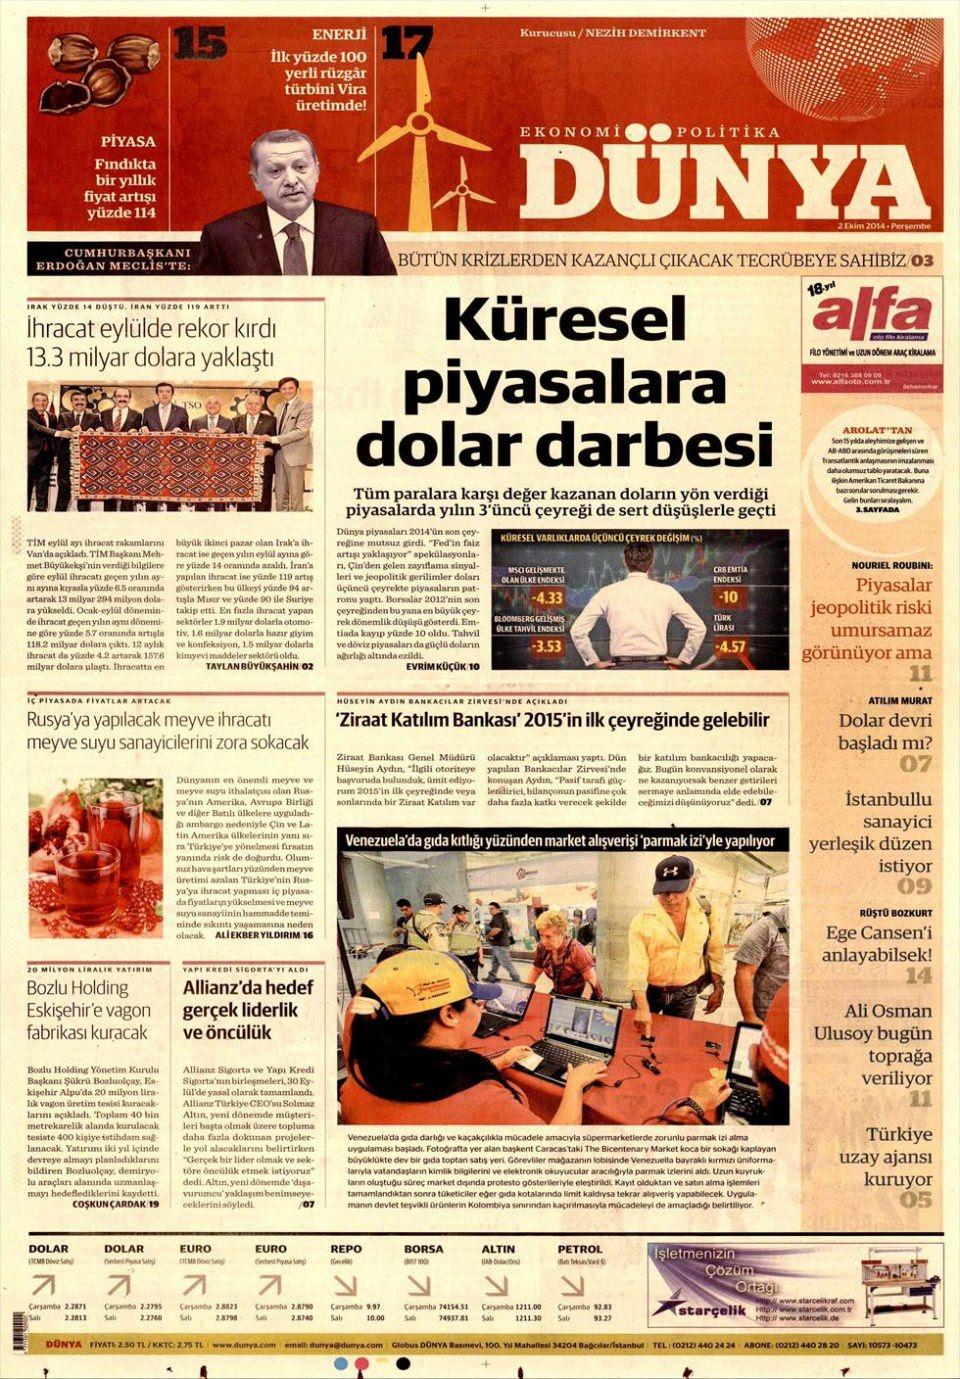 3 Ekim 2014 gazete manşetleri 5